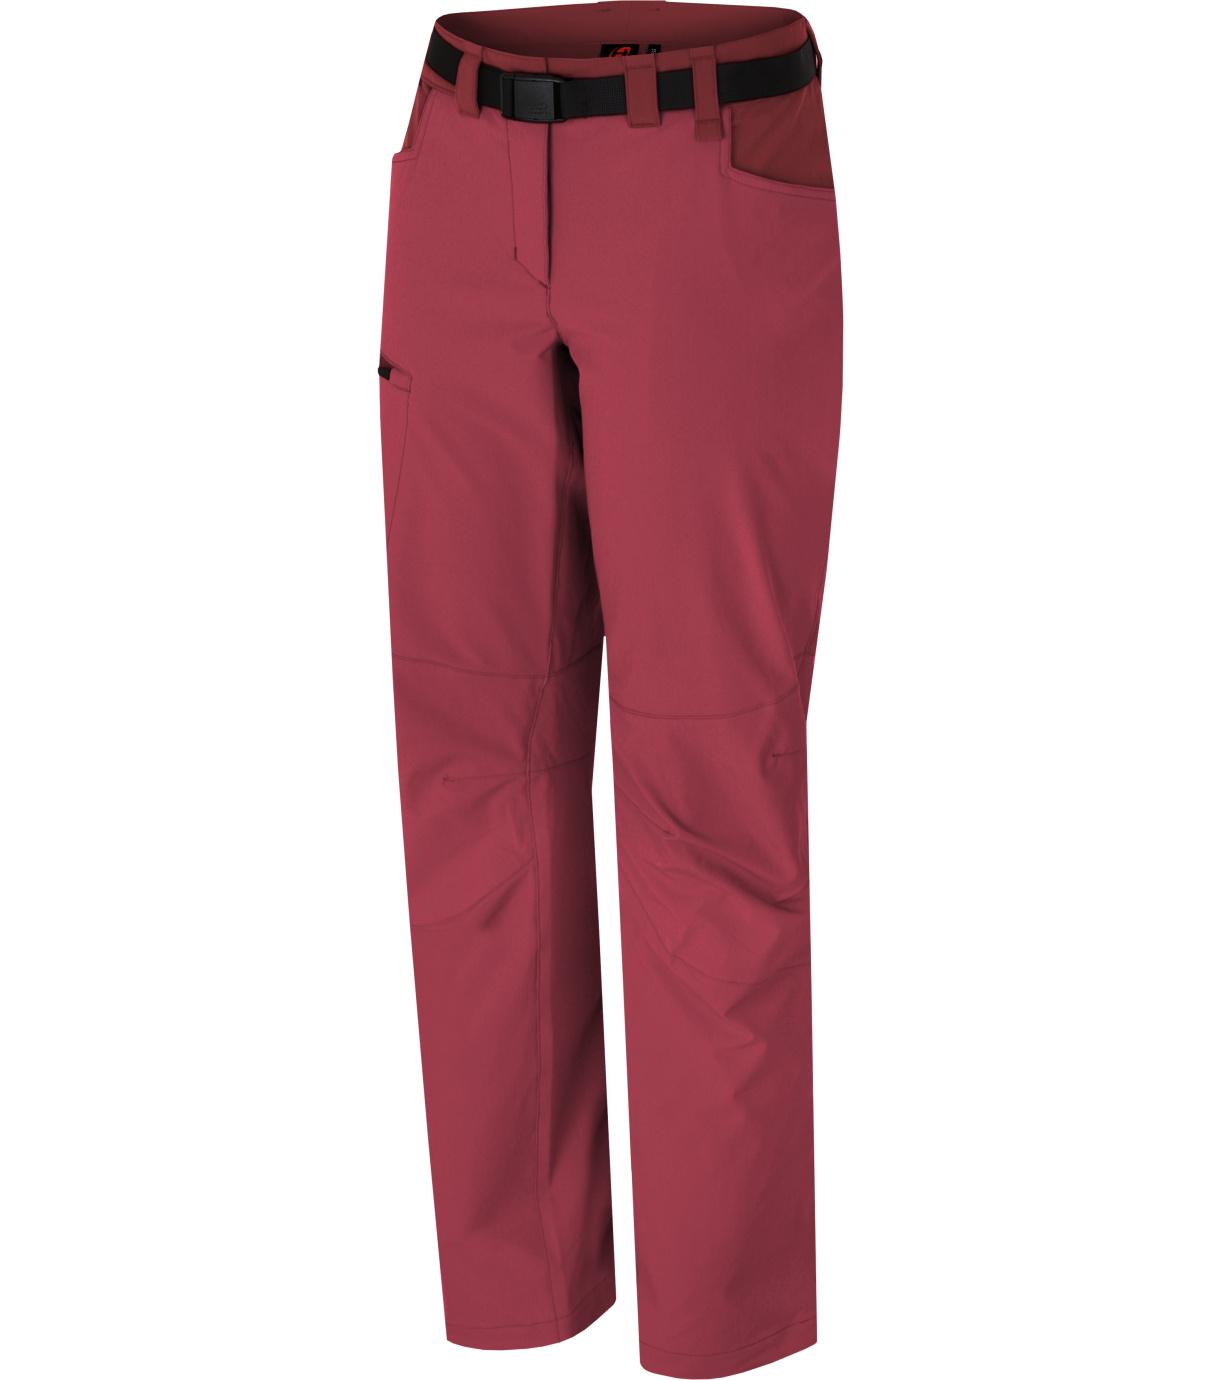 HANNAH MOA Dámské outdoorové kalhoty 10011109HHX01 deep claret/sun-dried tomato 36